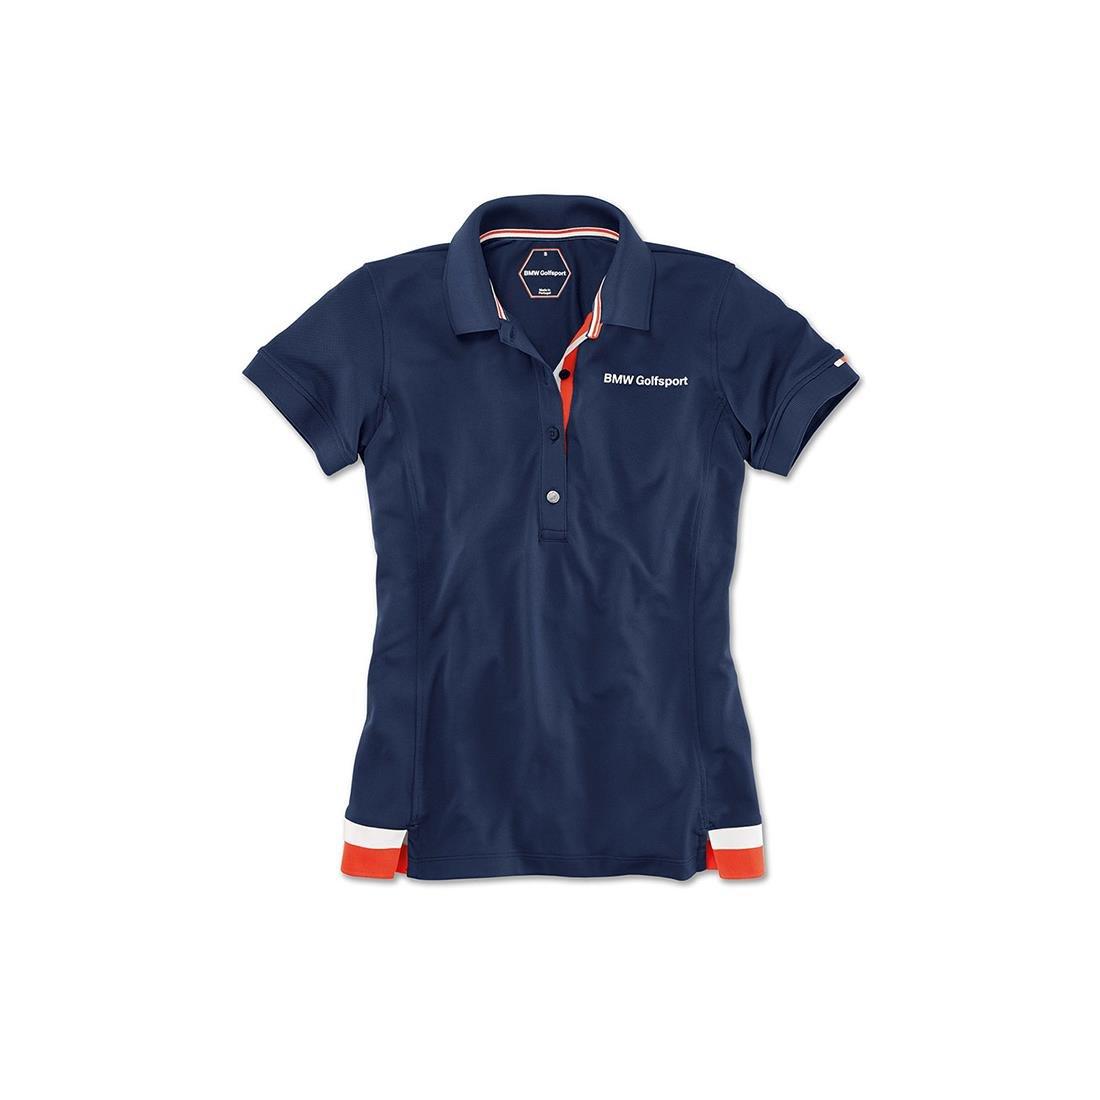 BMW Golfsport - Camiseta polo - azul marino - L: Amazon.es: Coche ...